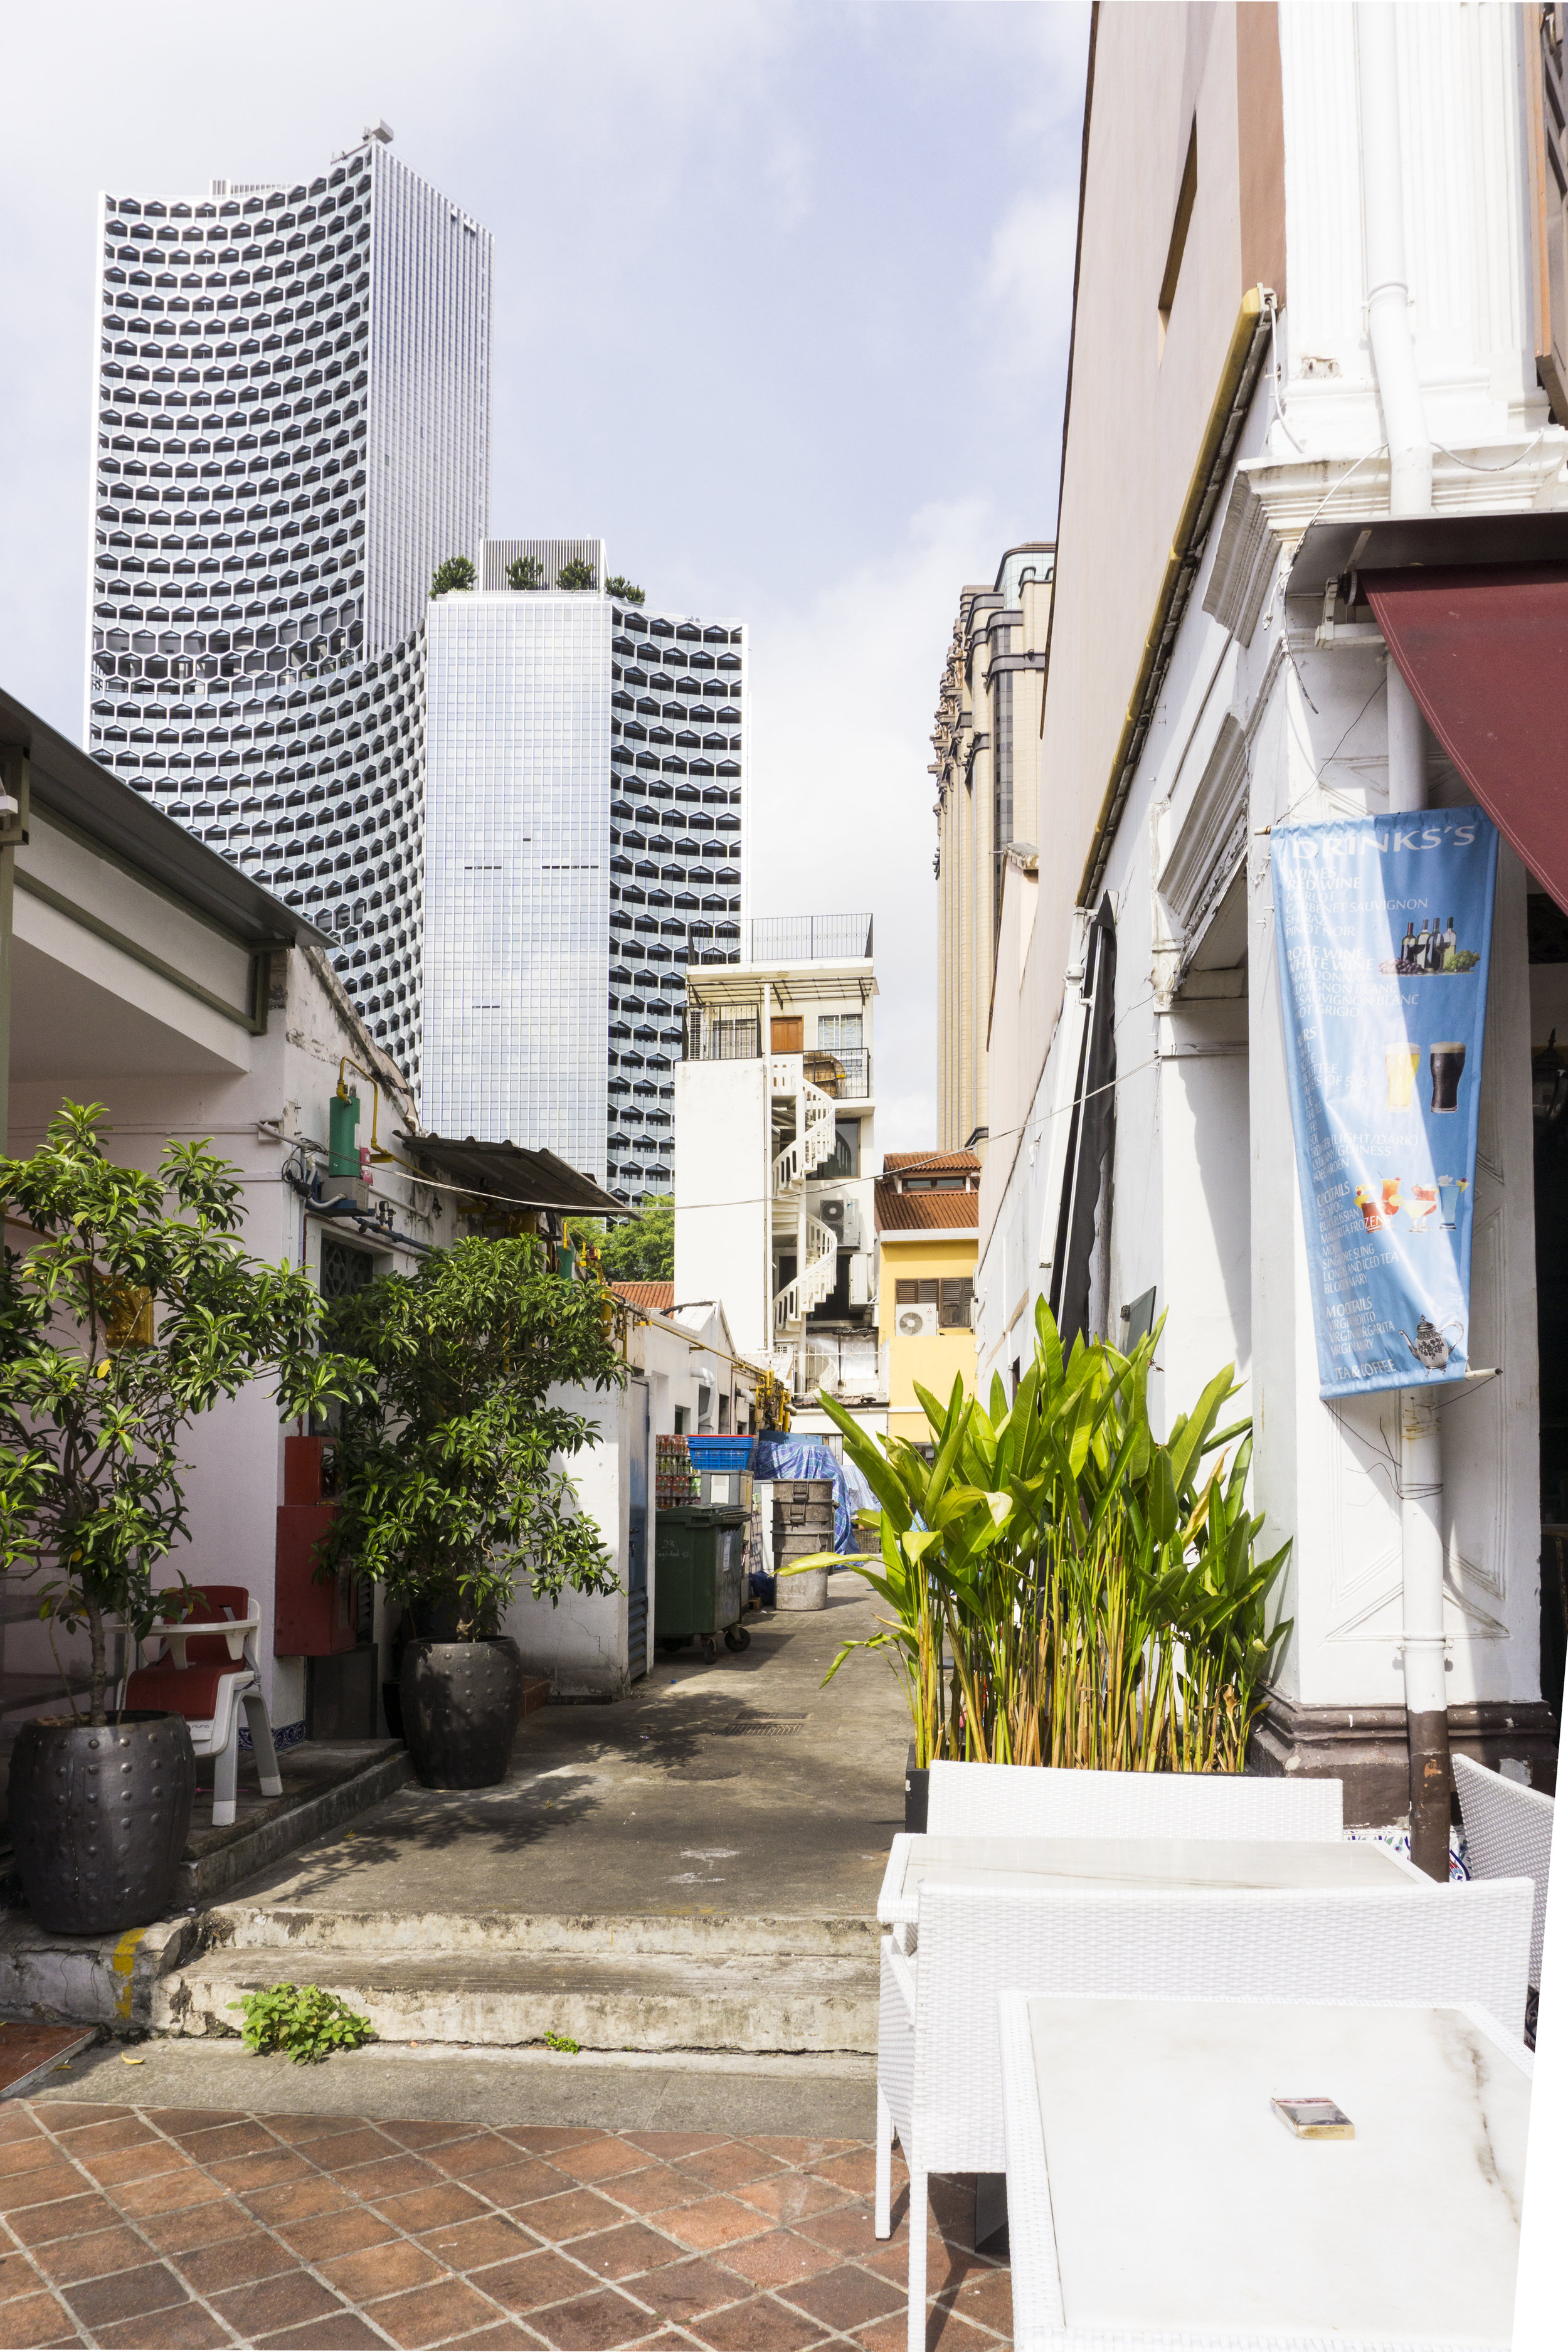 singapore arab street haji lane architecture